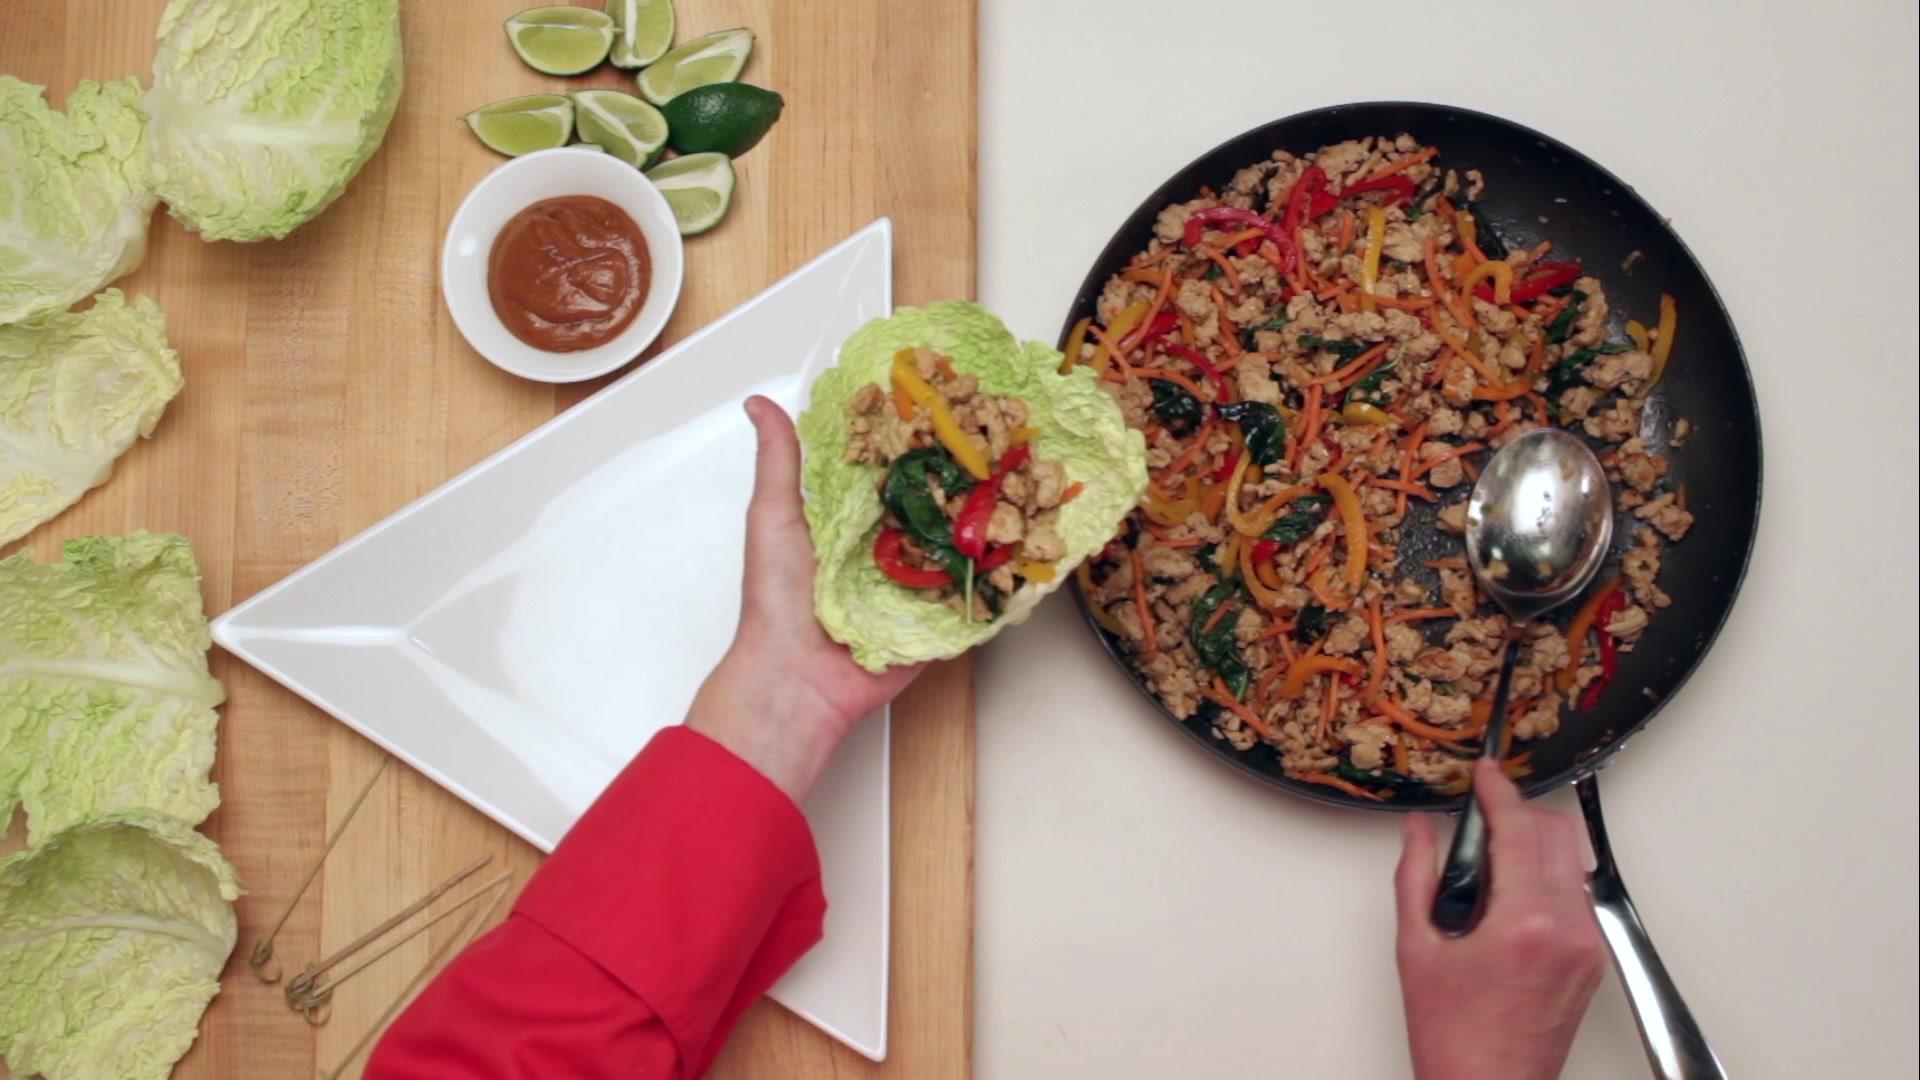 90 Second Thai Basil Chicken Wrap Recipe